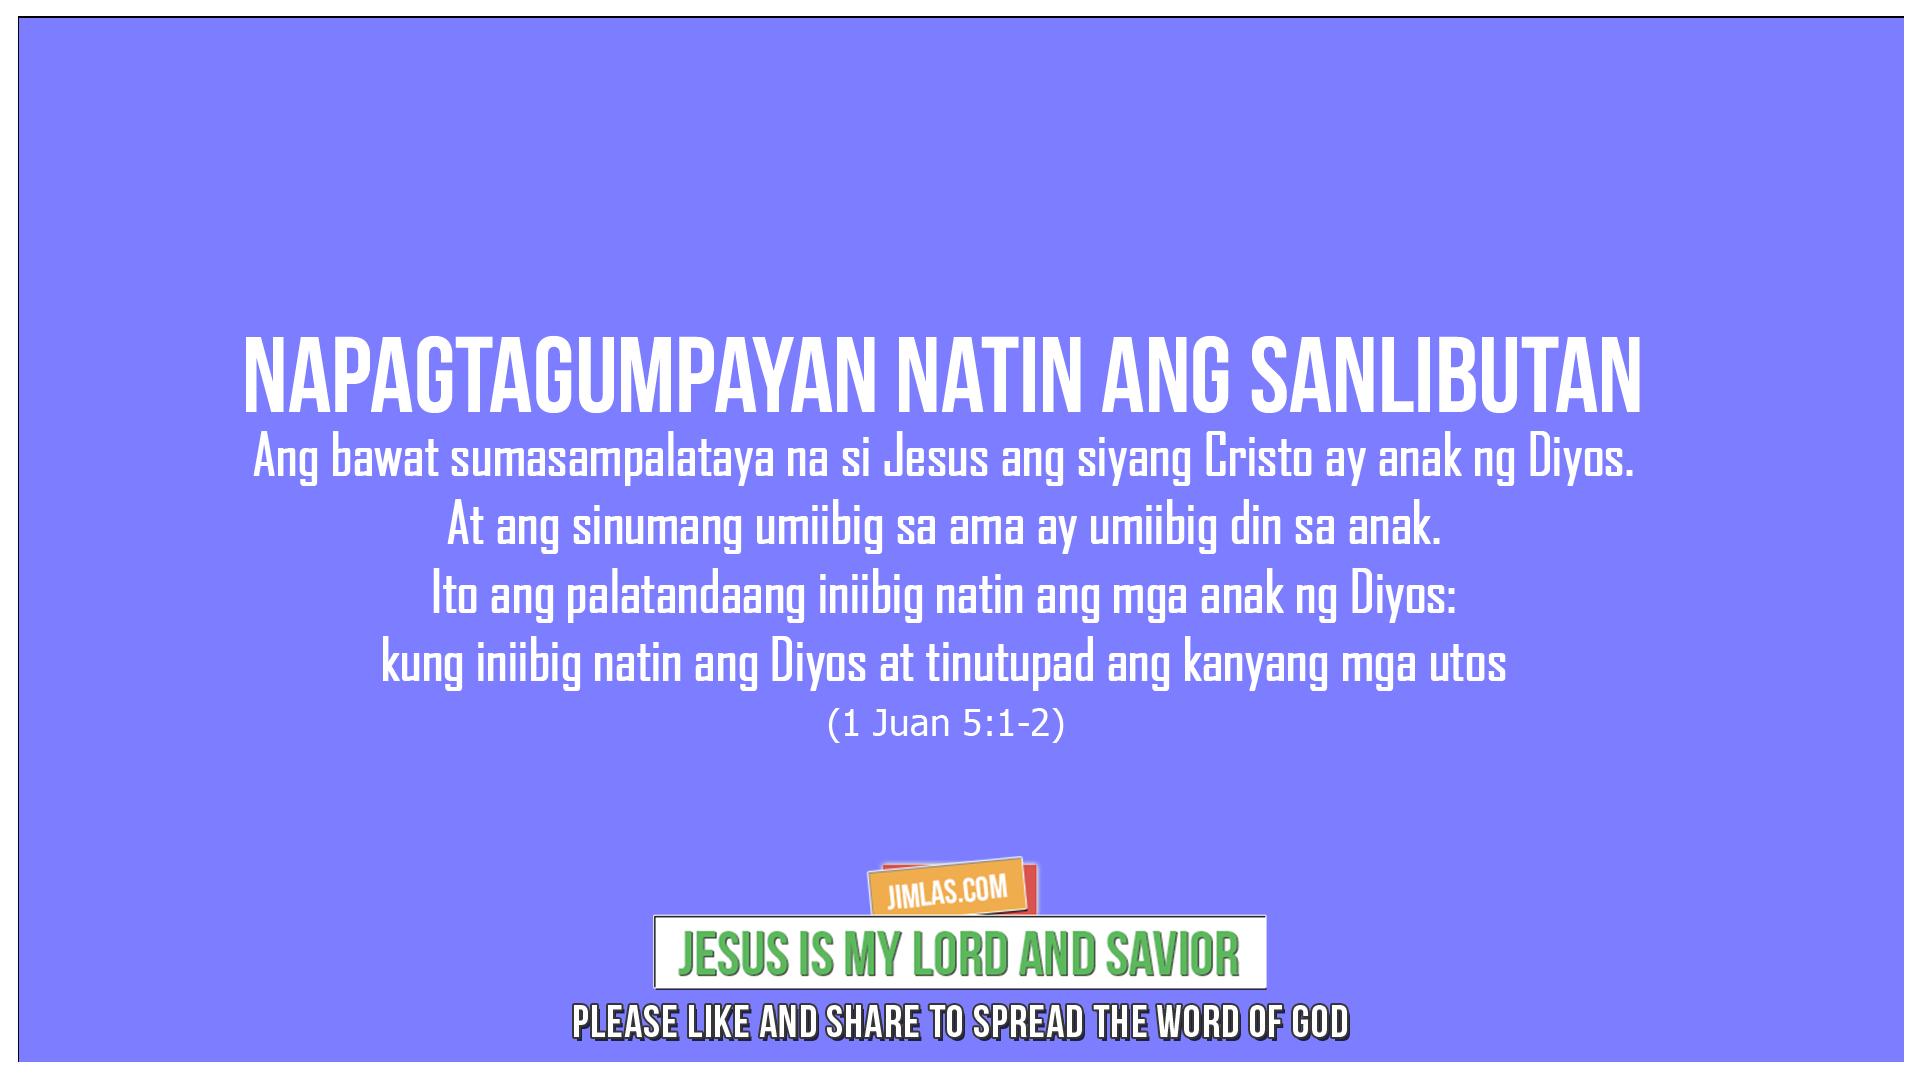 1 Juan 5:1-2, 1 Juan 5:1-2